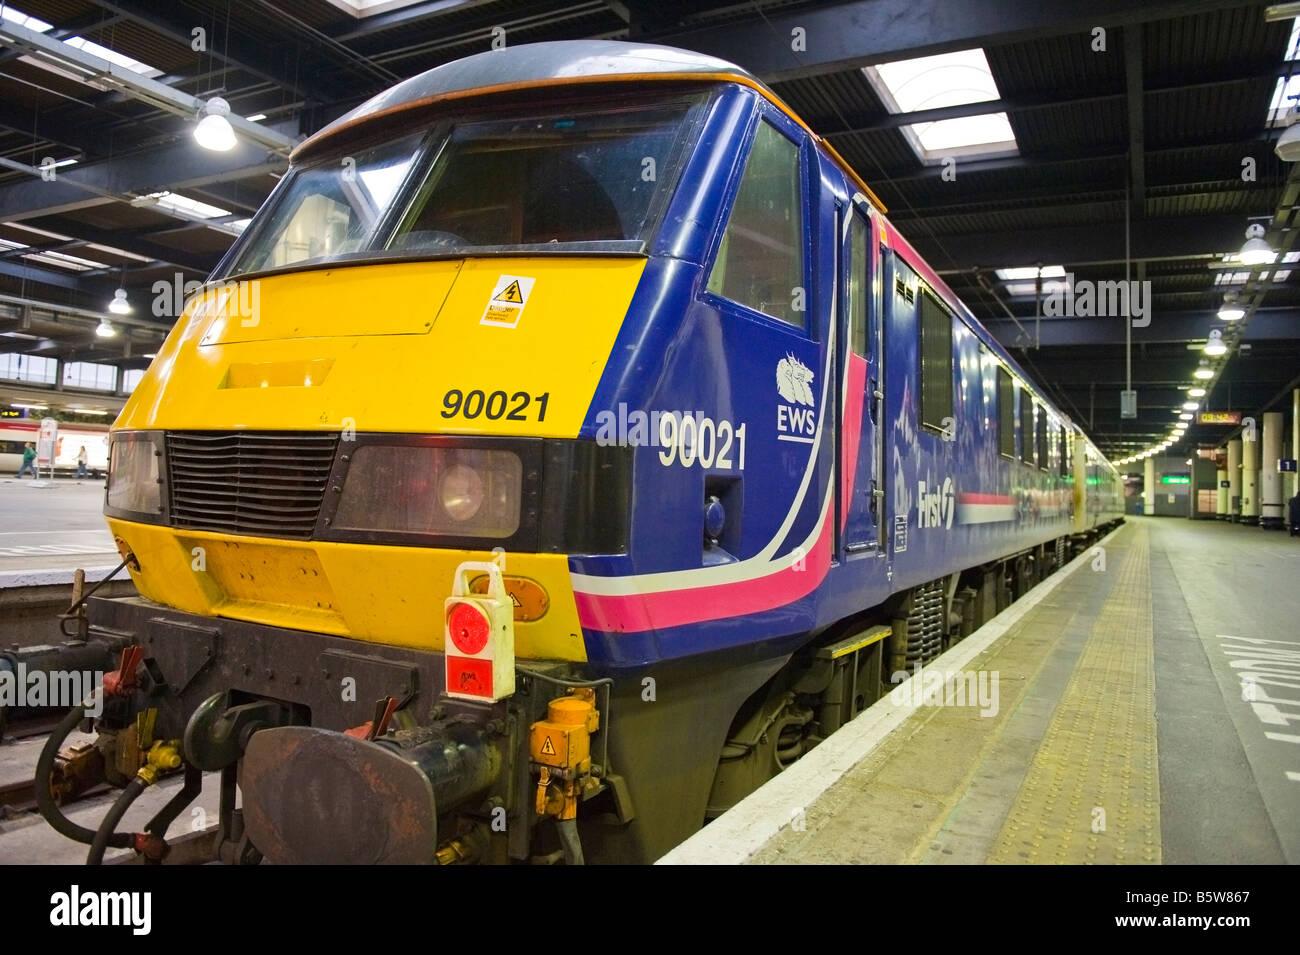 London , Euston Railways Station , EWS First Scot Rail train engine at platform - Stock Image